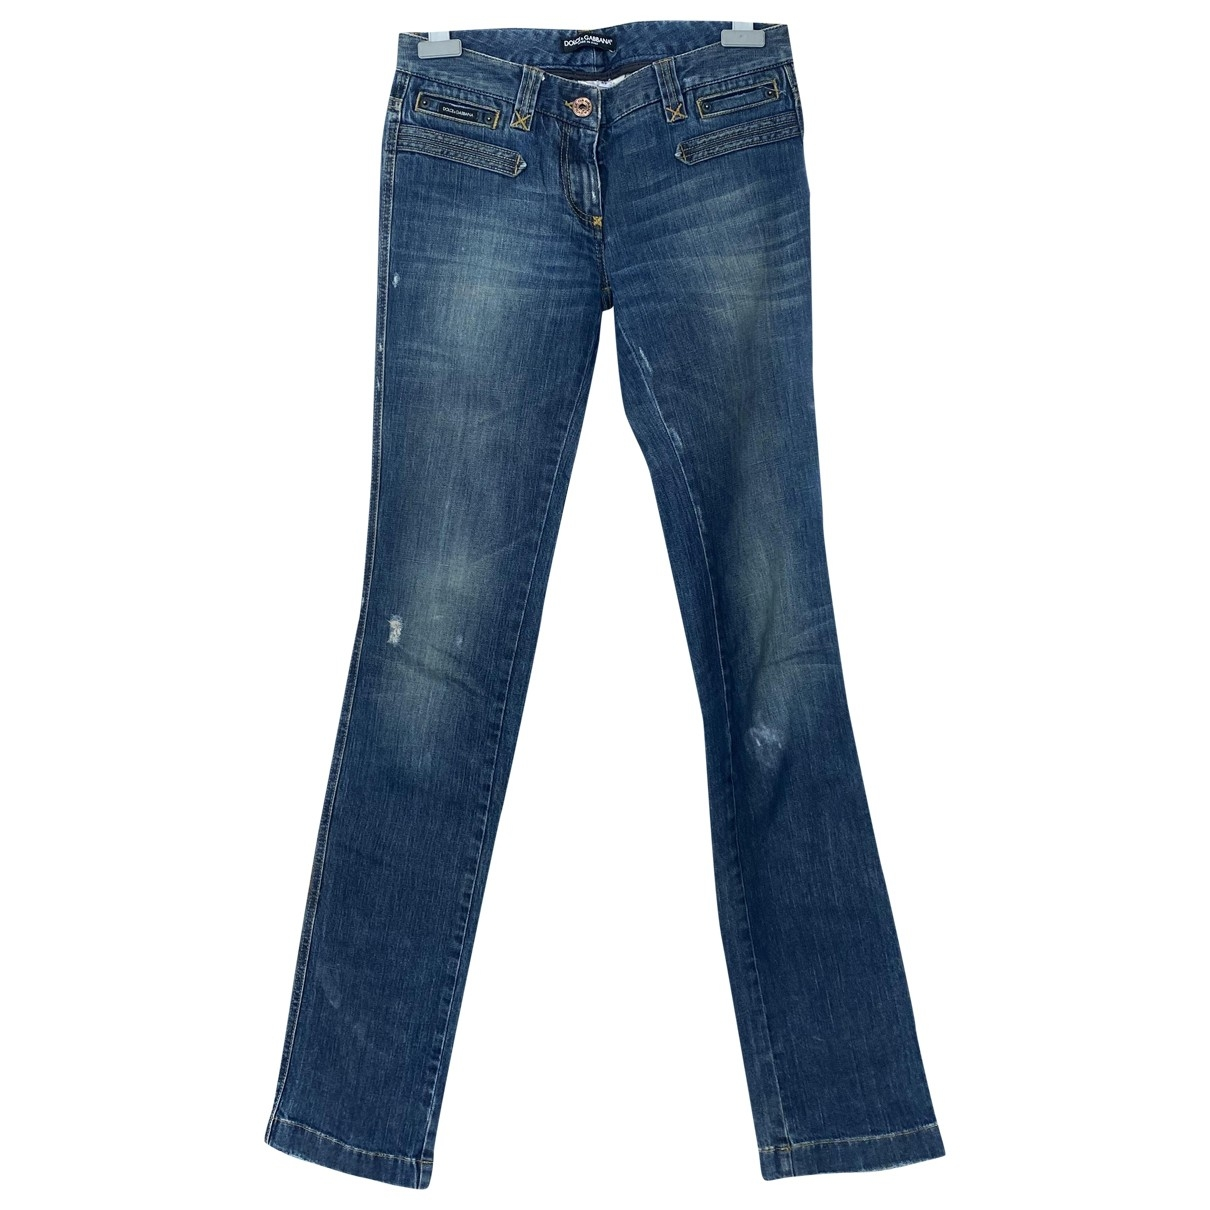 Dolce & Gabbana - Jean   pour femme en denim - bleu